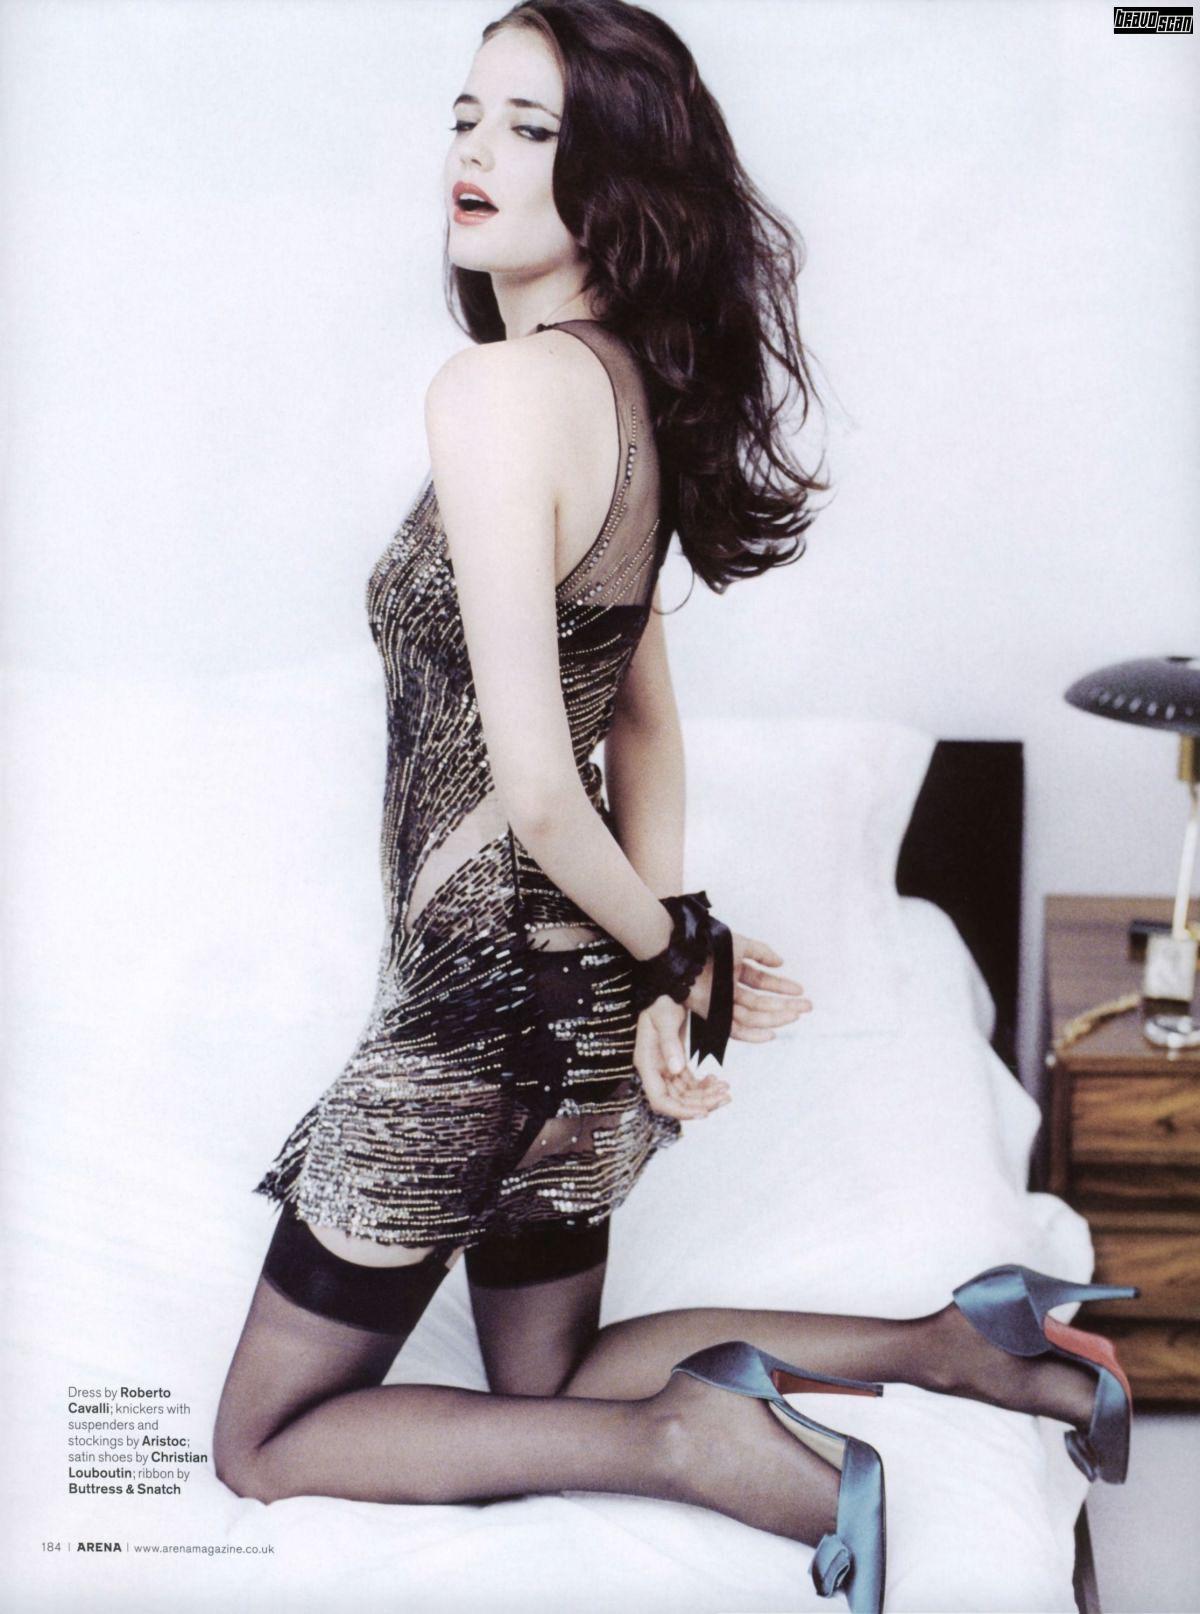 Eva Green photo 56 of 920 pics, wallpaper - photo #71800 ... Eva Green Twitter